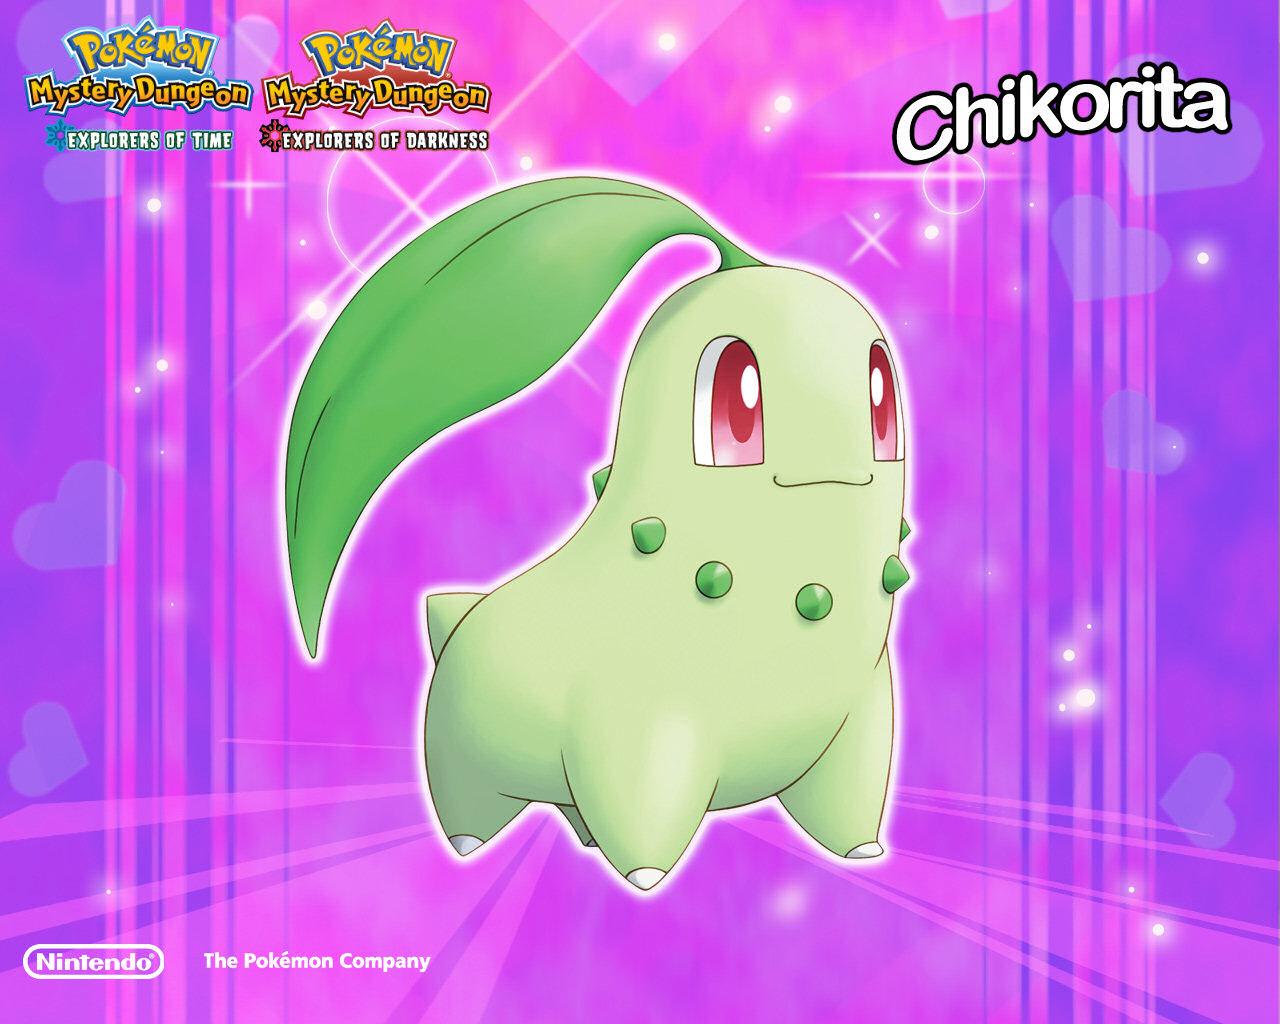 http://3.bp.blogspot.com/_6aazlqyJHmE/TTJYIE7AmLI/AAAAAAAAAFQ/bg3wIW8FH1Q/s1600/pokemon-wallpaper-032.jpg